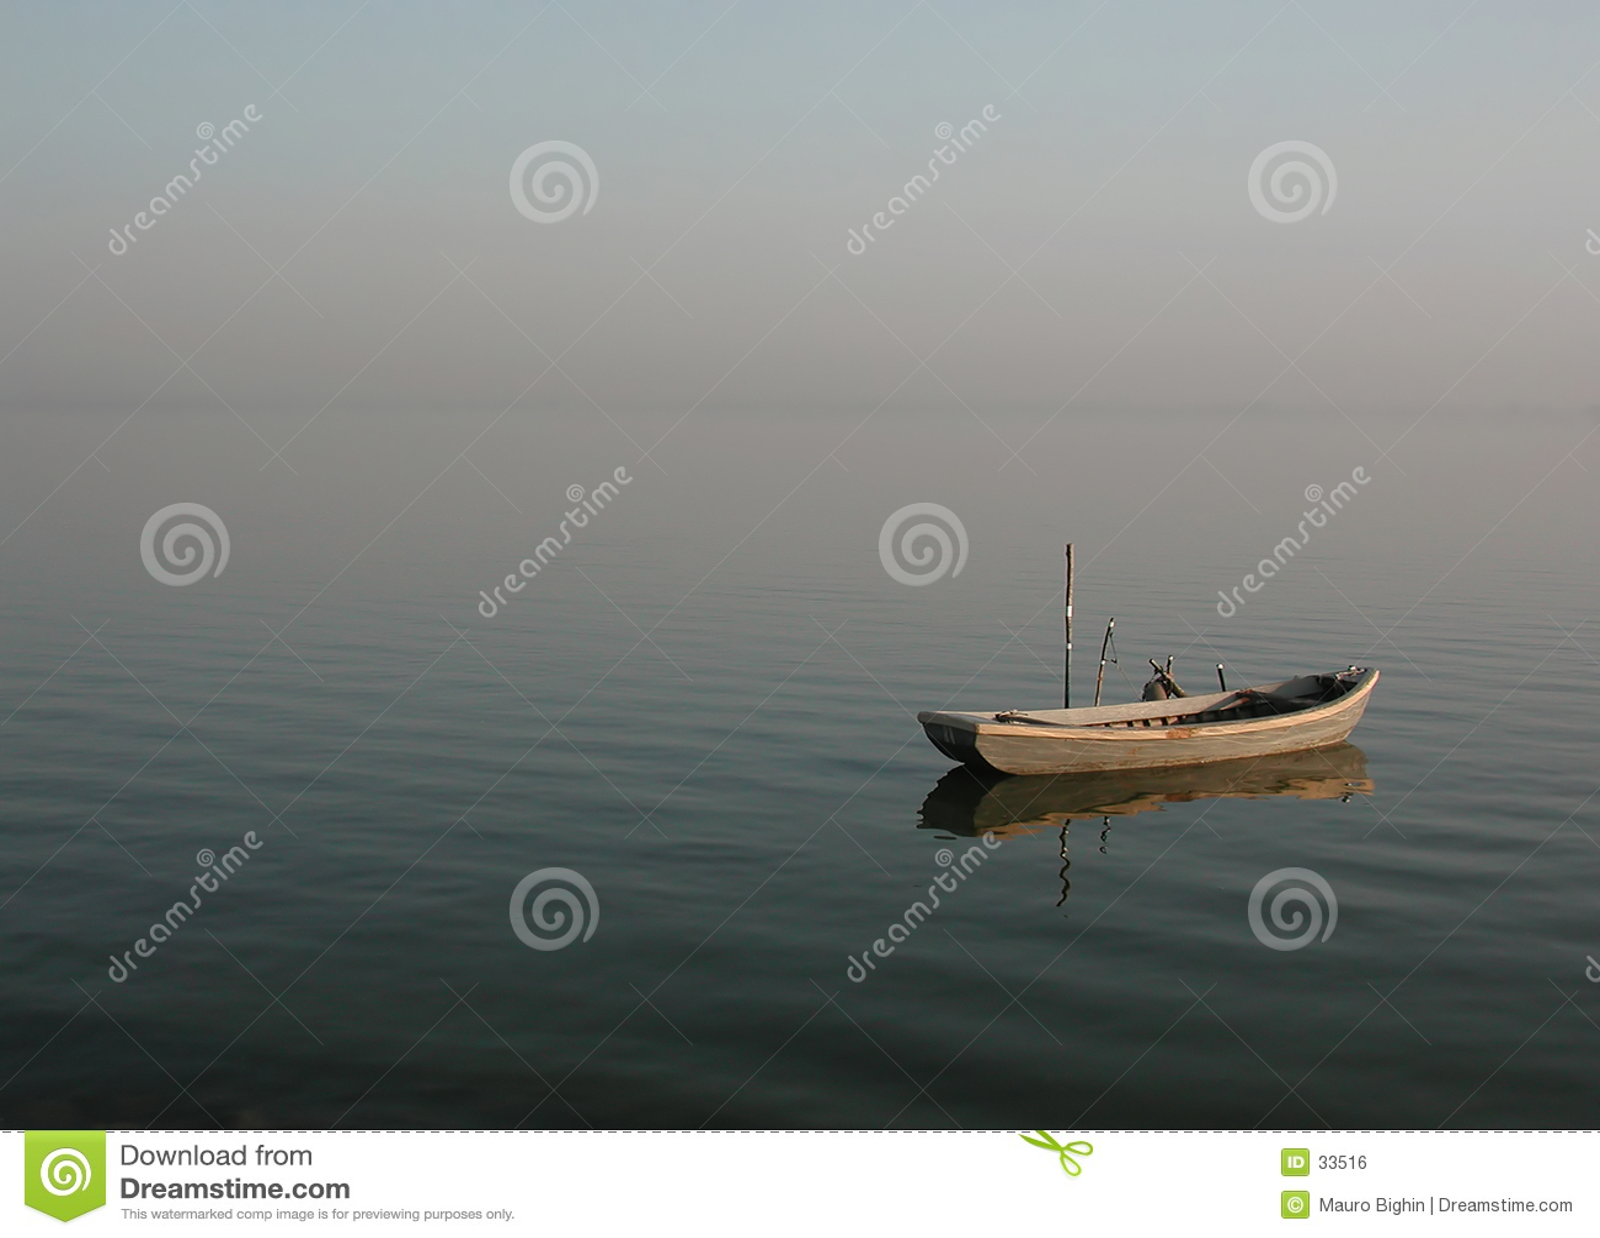 Lonely lagoon boat - calmness